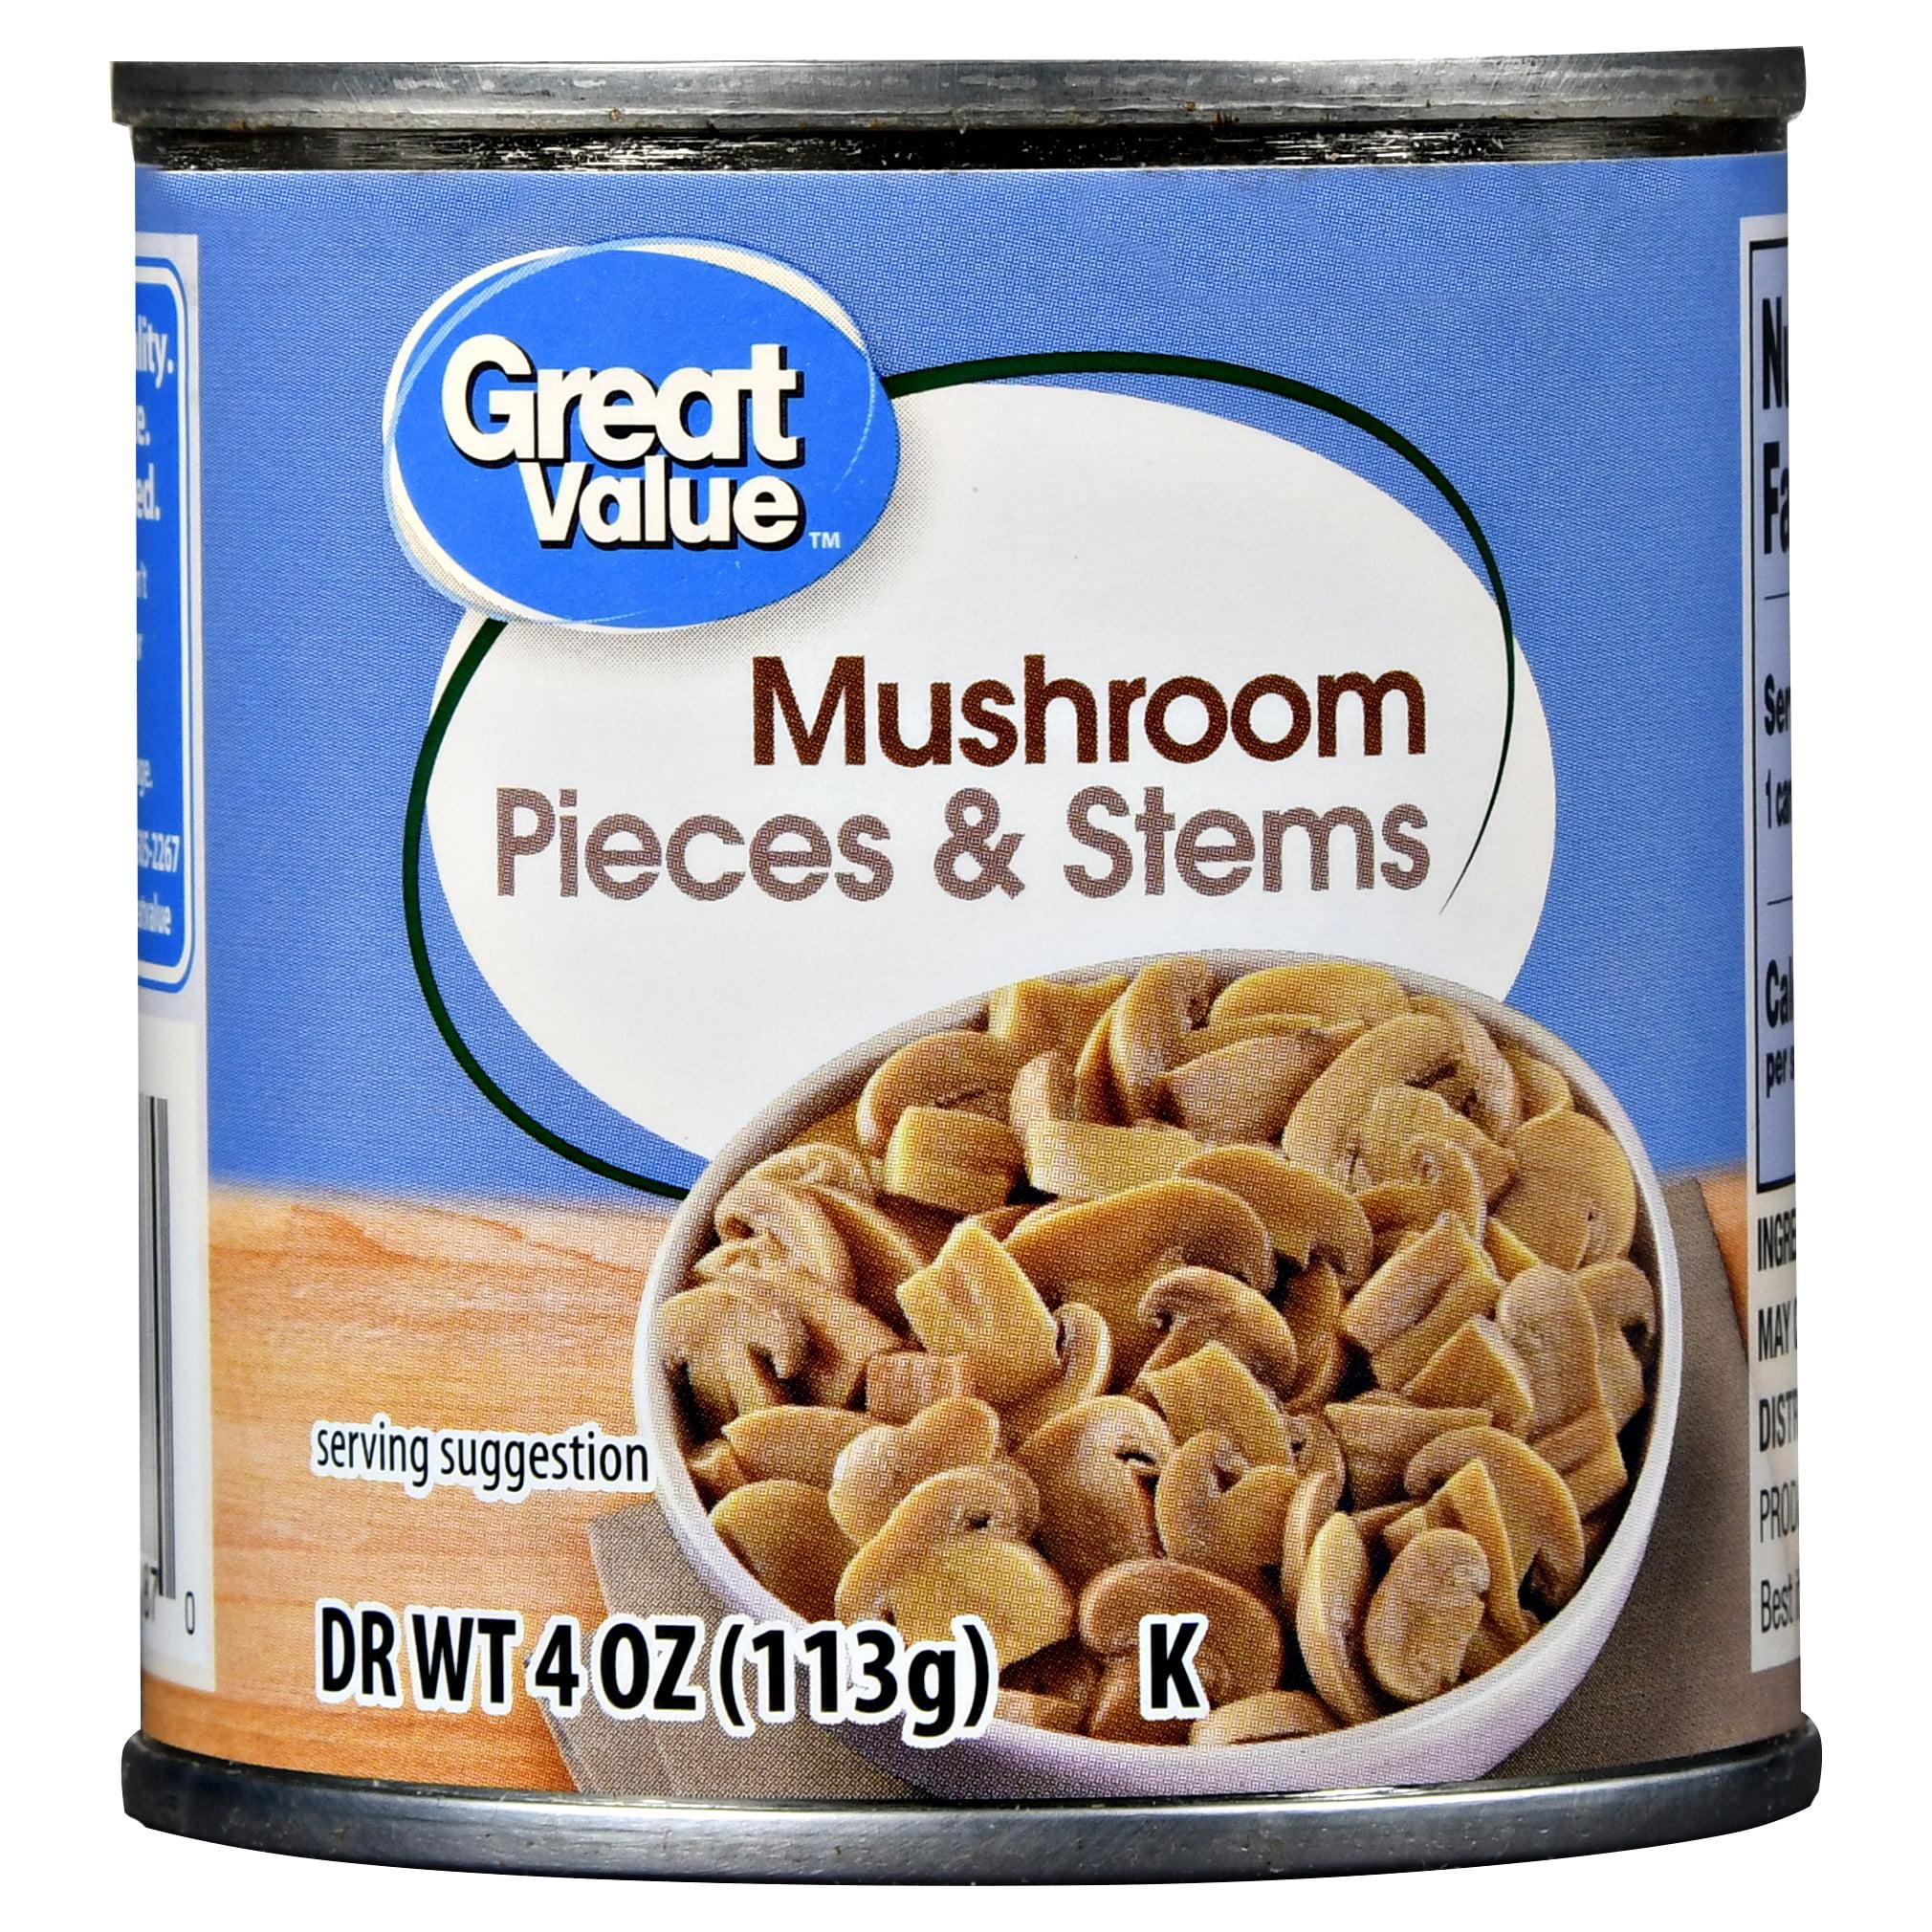 Great Value Pieces & Stems Mushrooms, 4 Oz